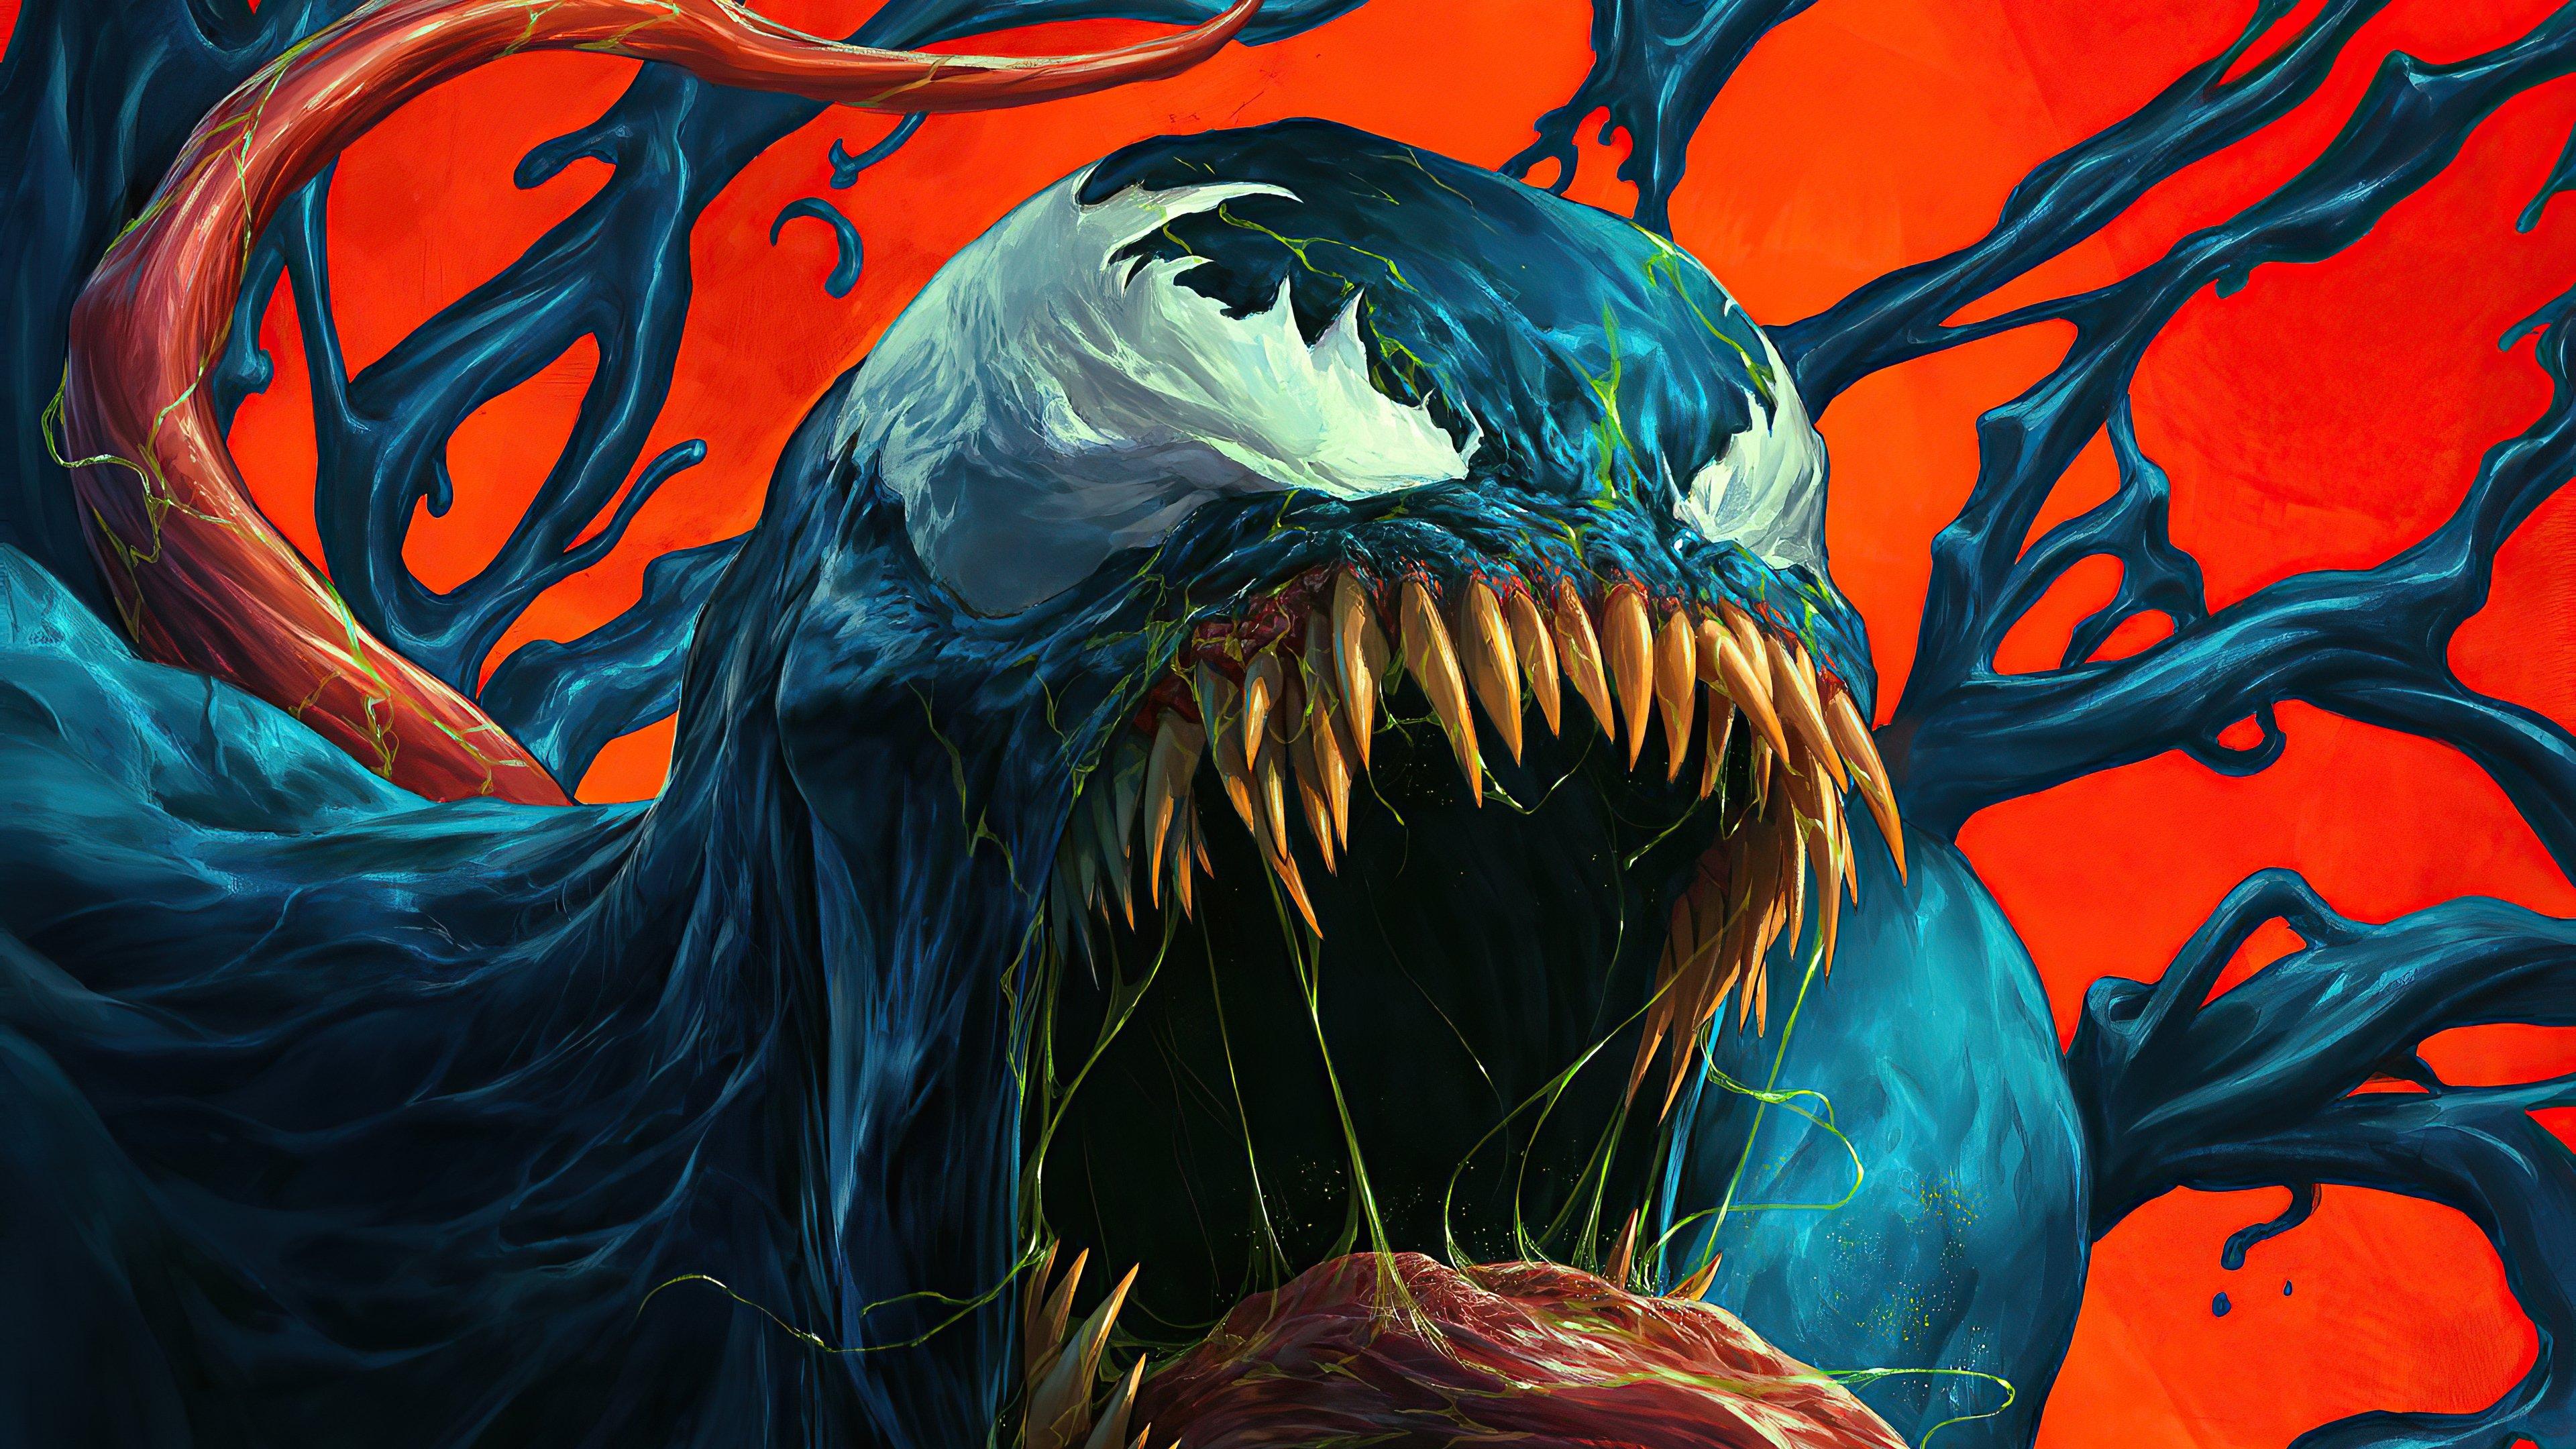 Wallpaper Venom Artwork 2020